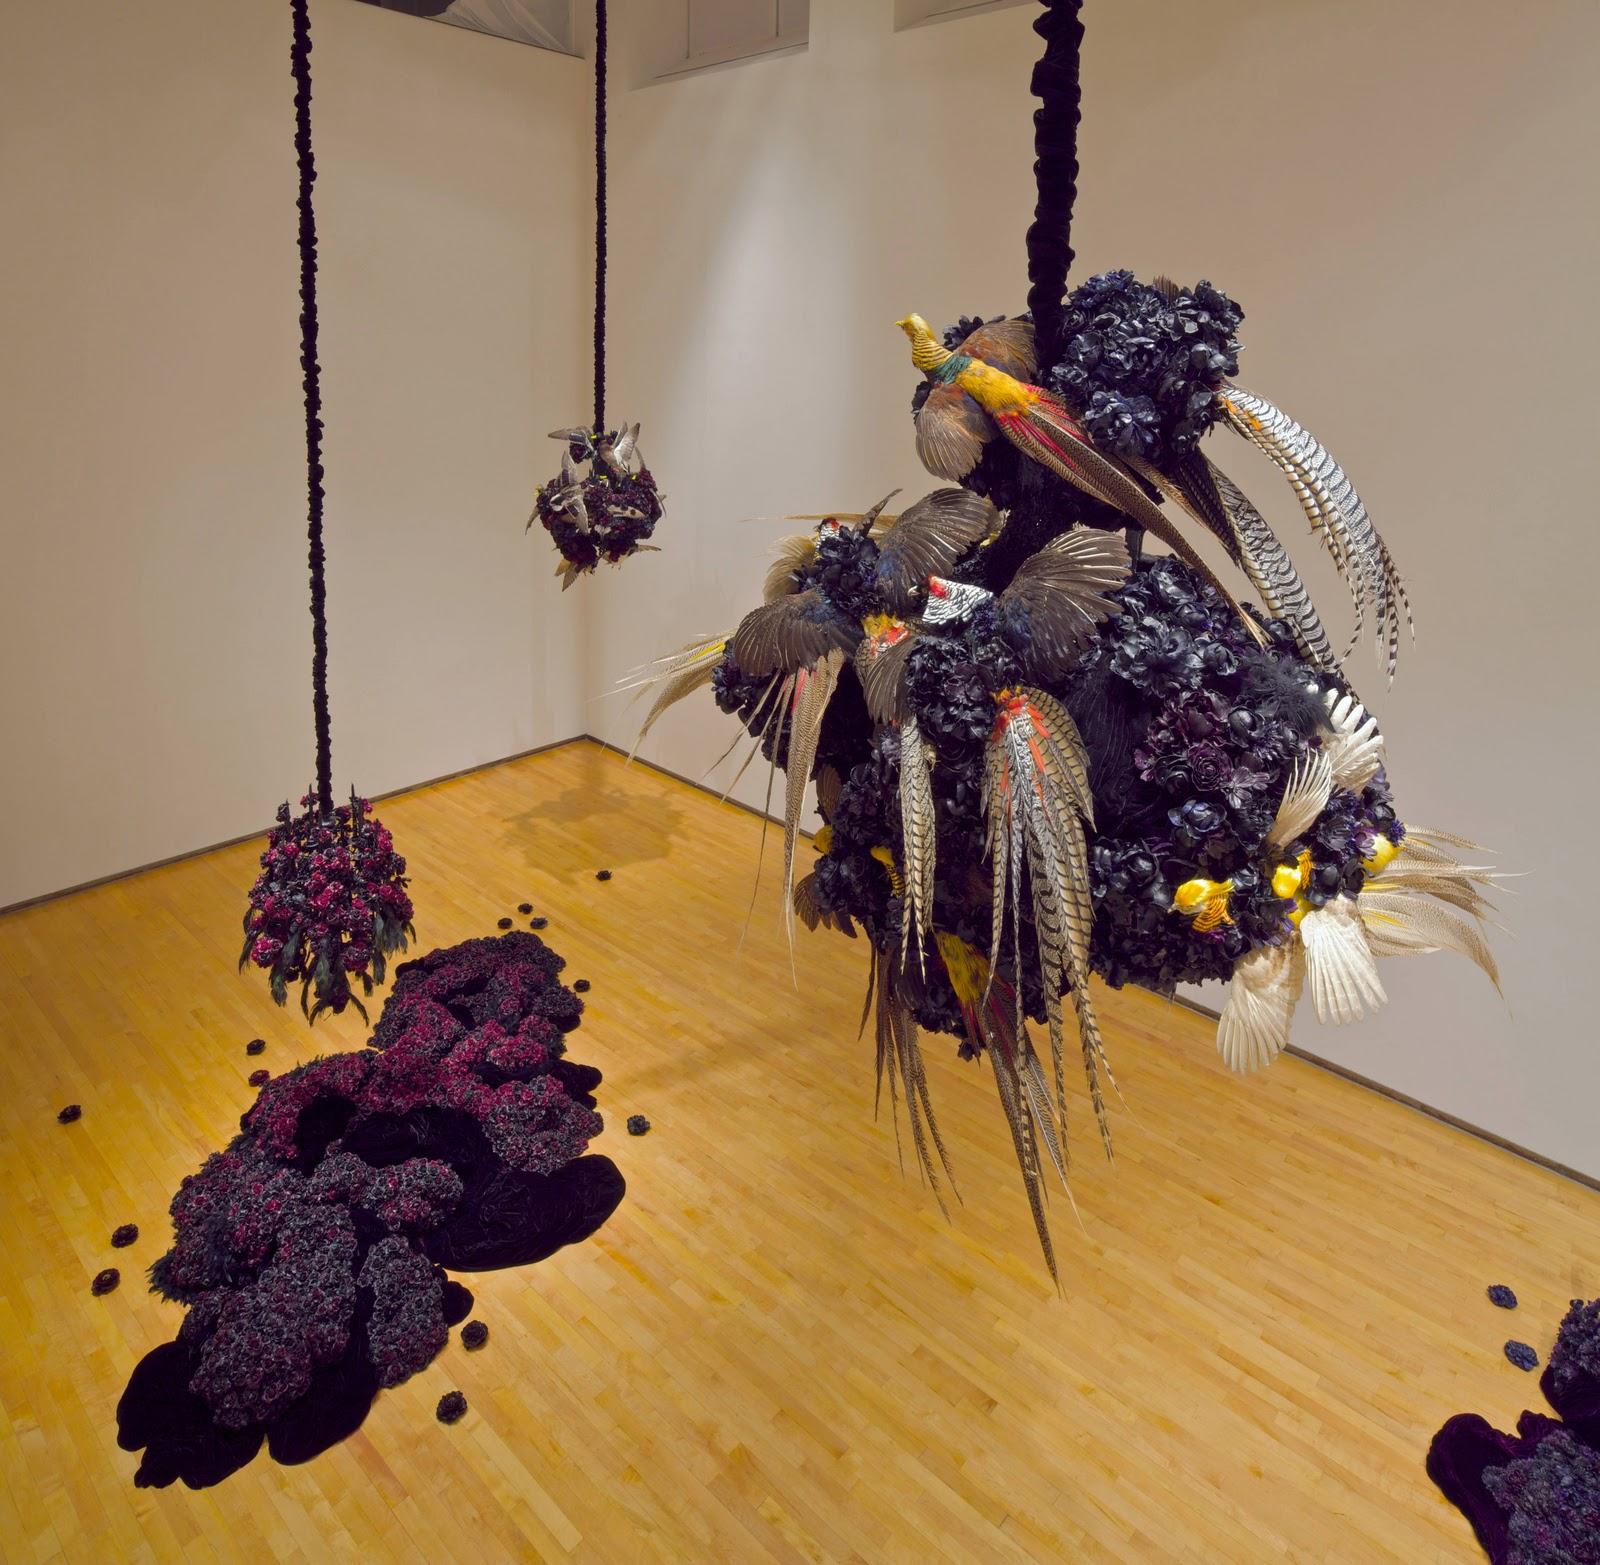 Nichole S Art Blog Petah Coyne